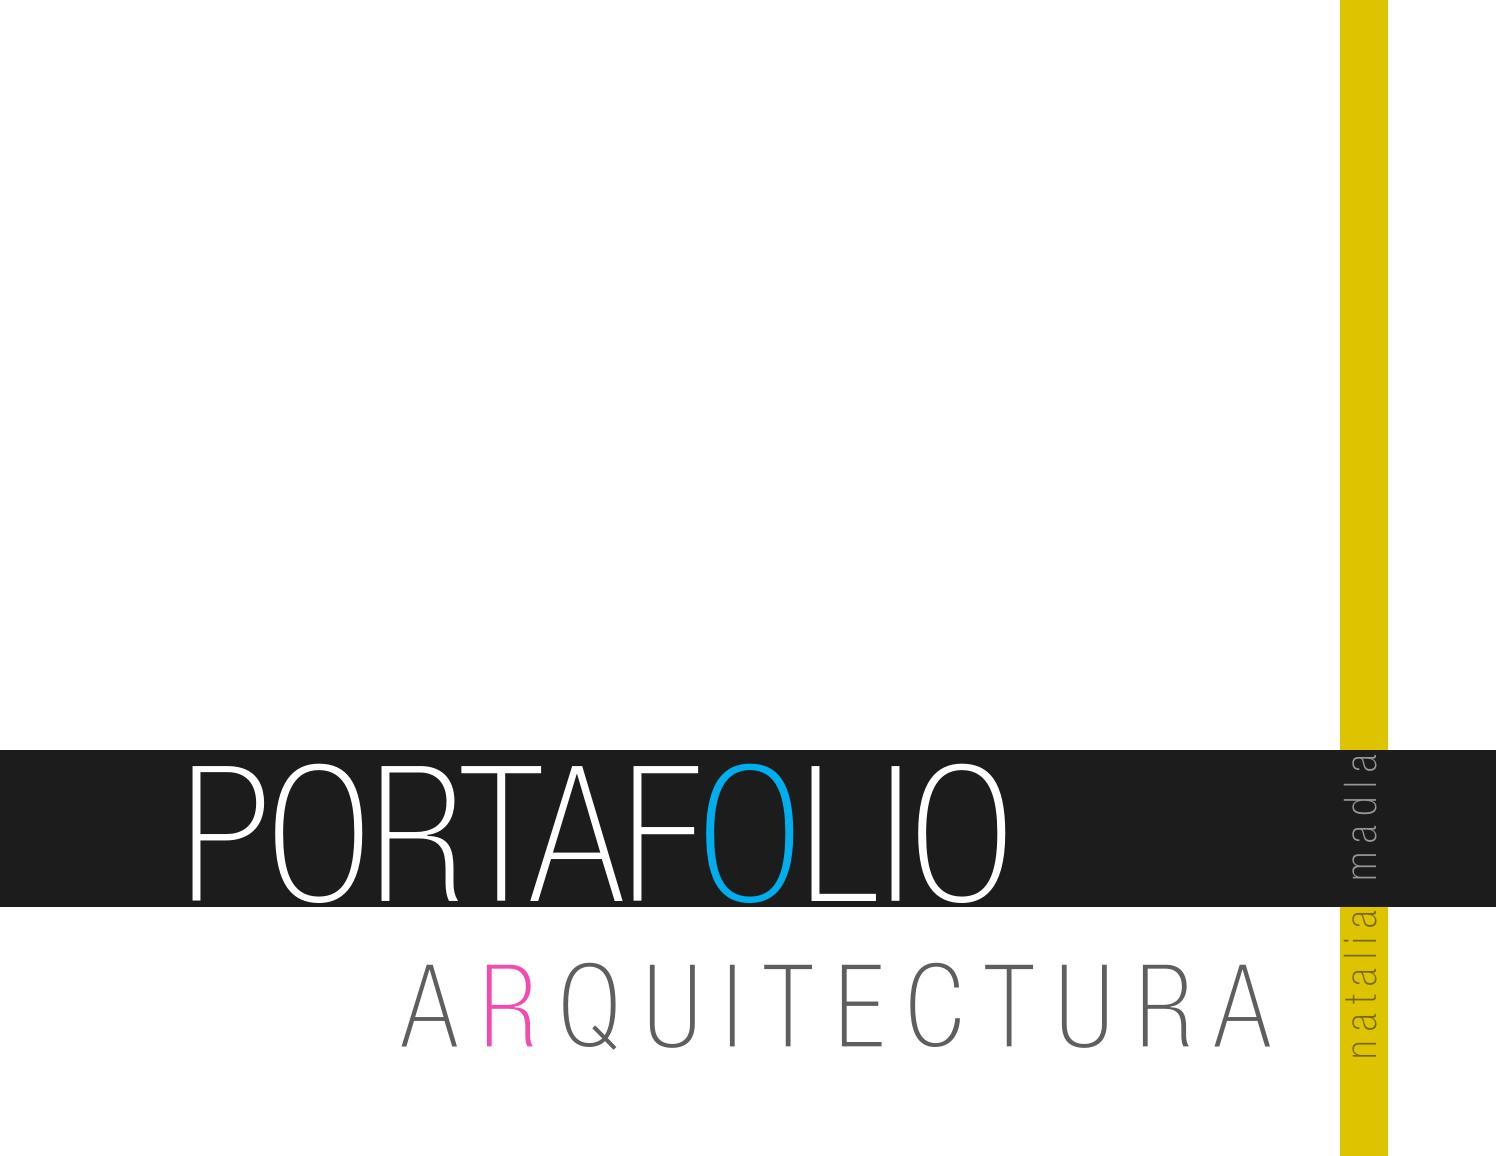 Portafolio arquitectura by natalia madla issuu for Portafolio arquitectura